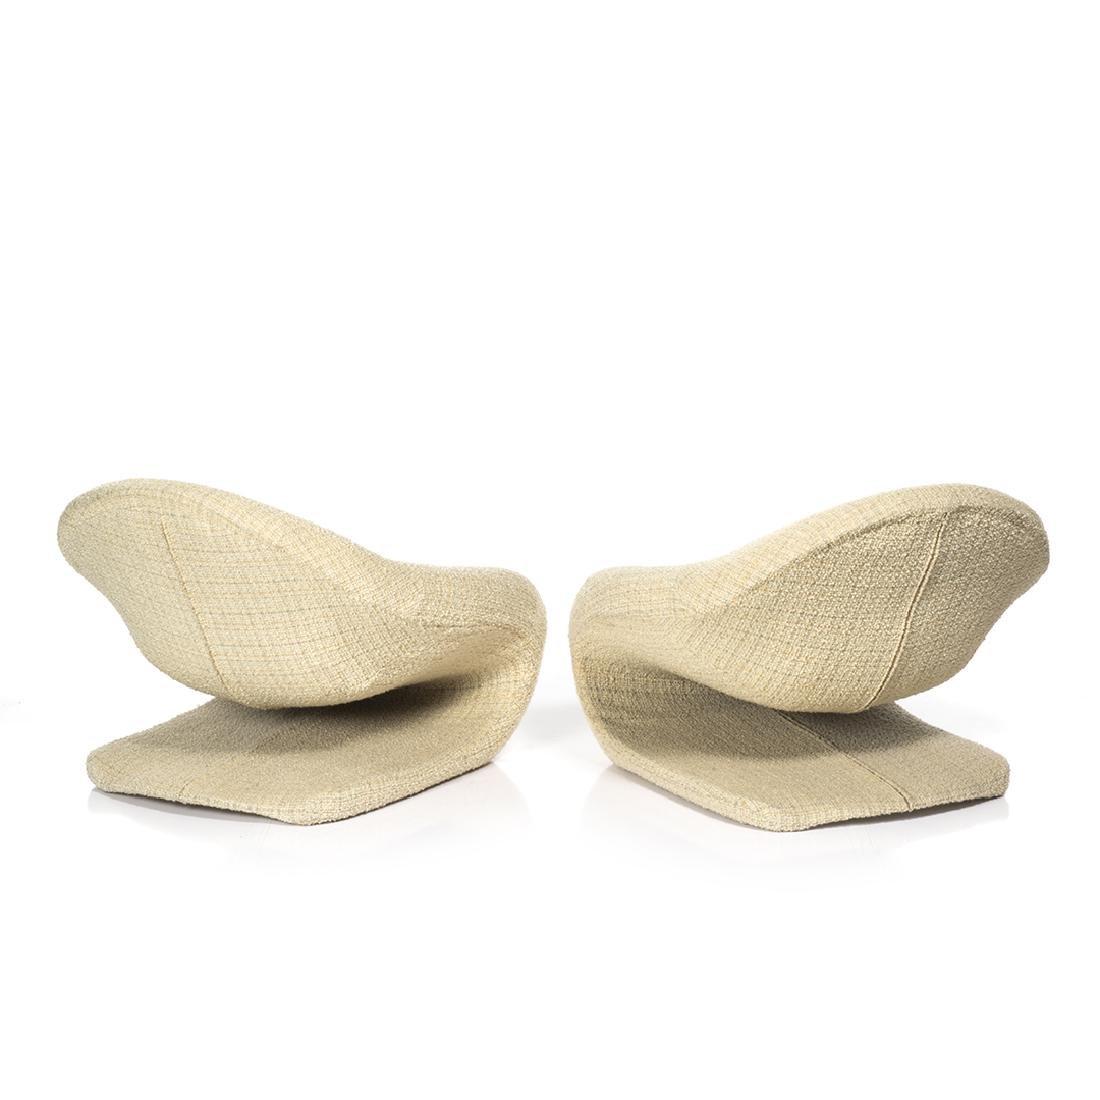 R. Huber Lounge Chairs (2) - 3